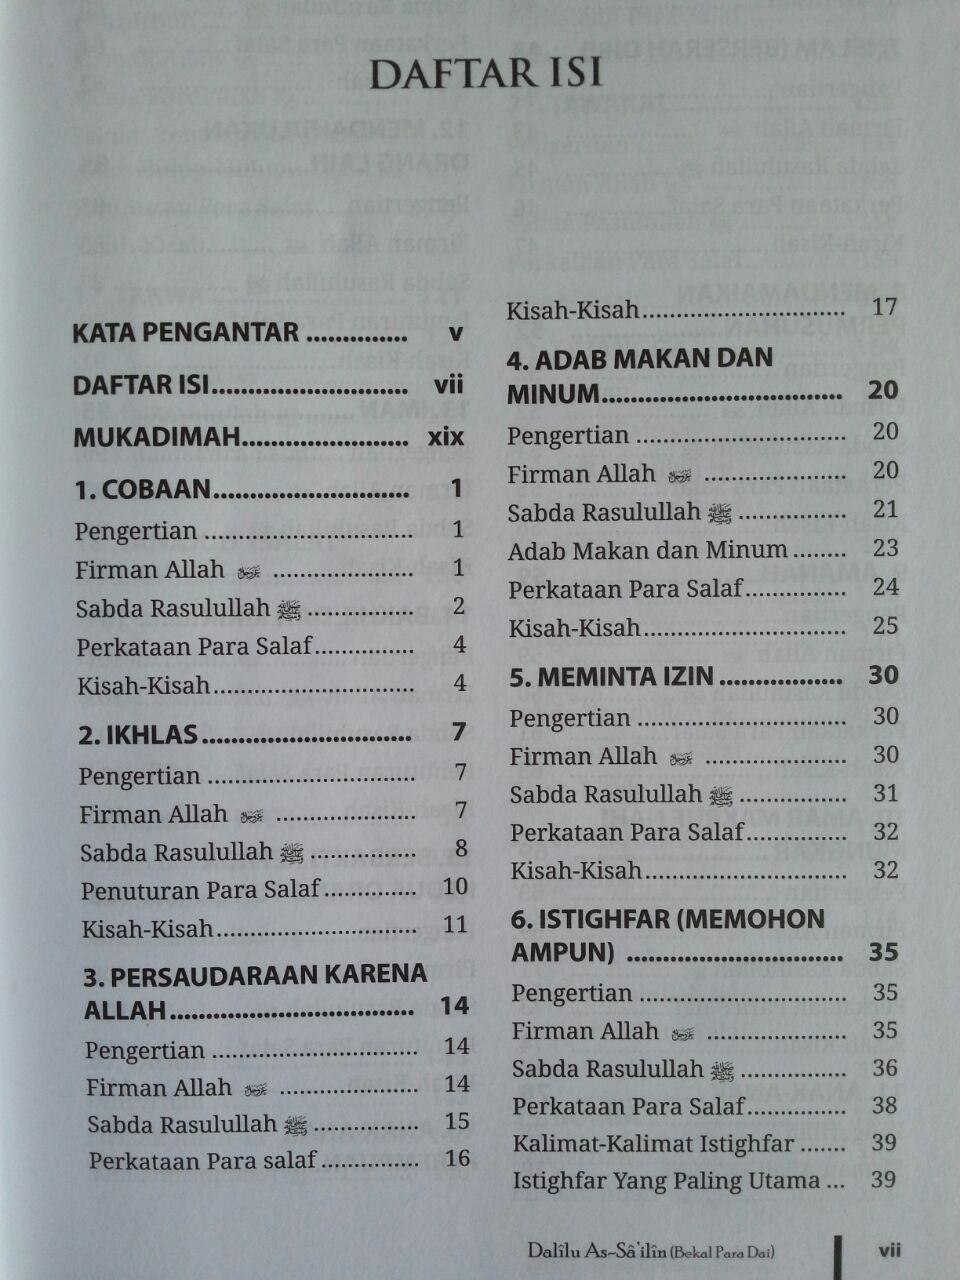 Buku Dalilu As-Sailin Bekal Seorang Dai isi